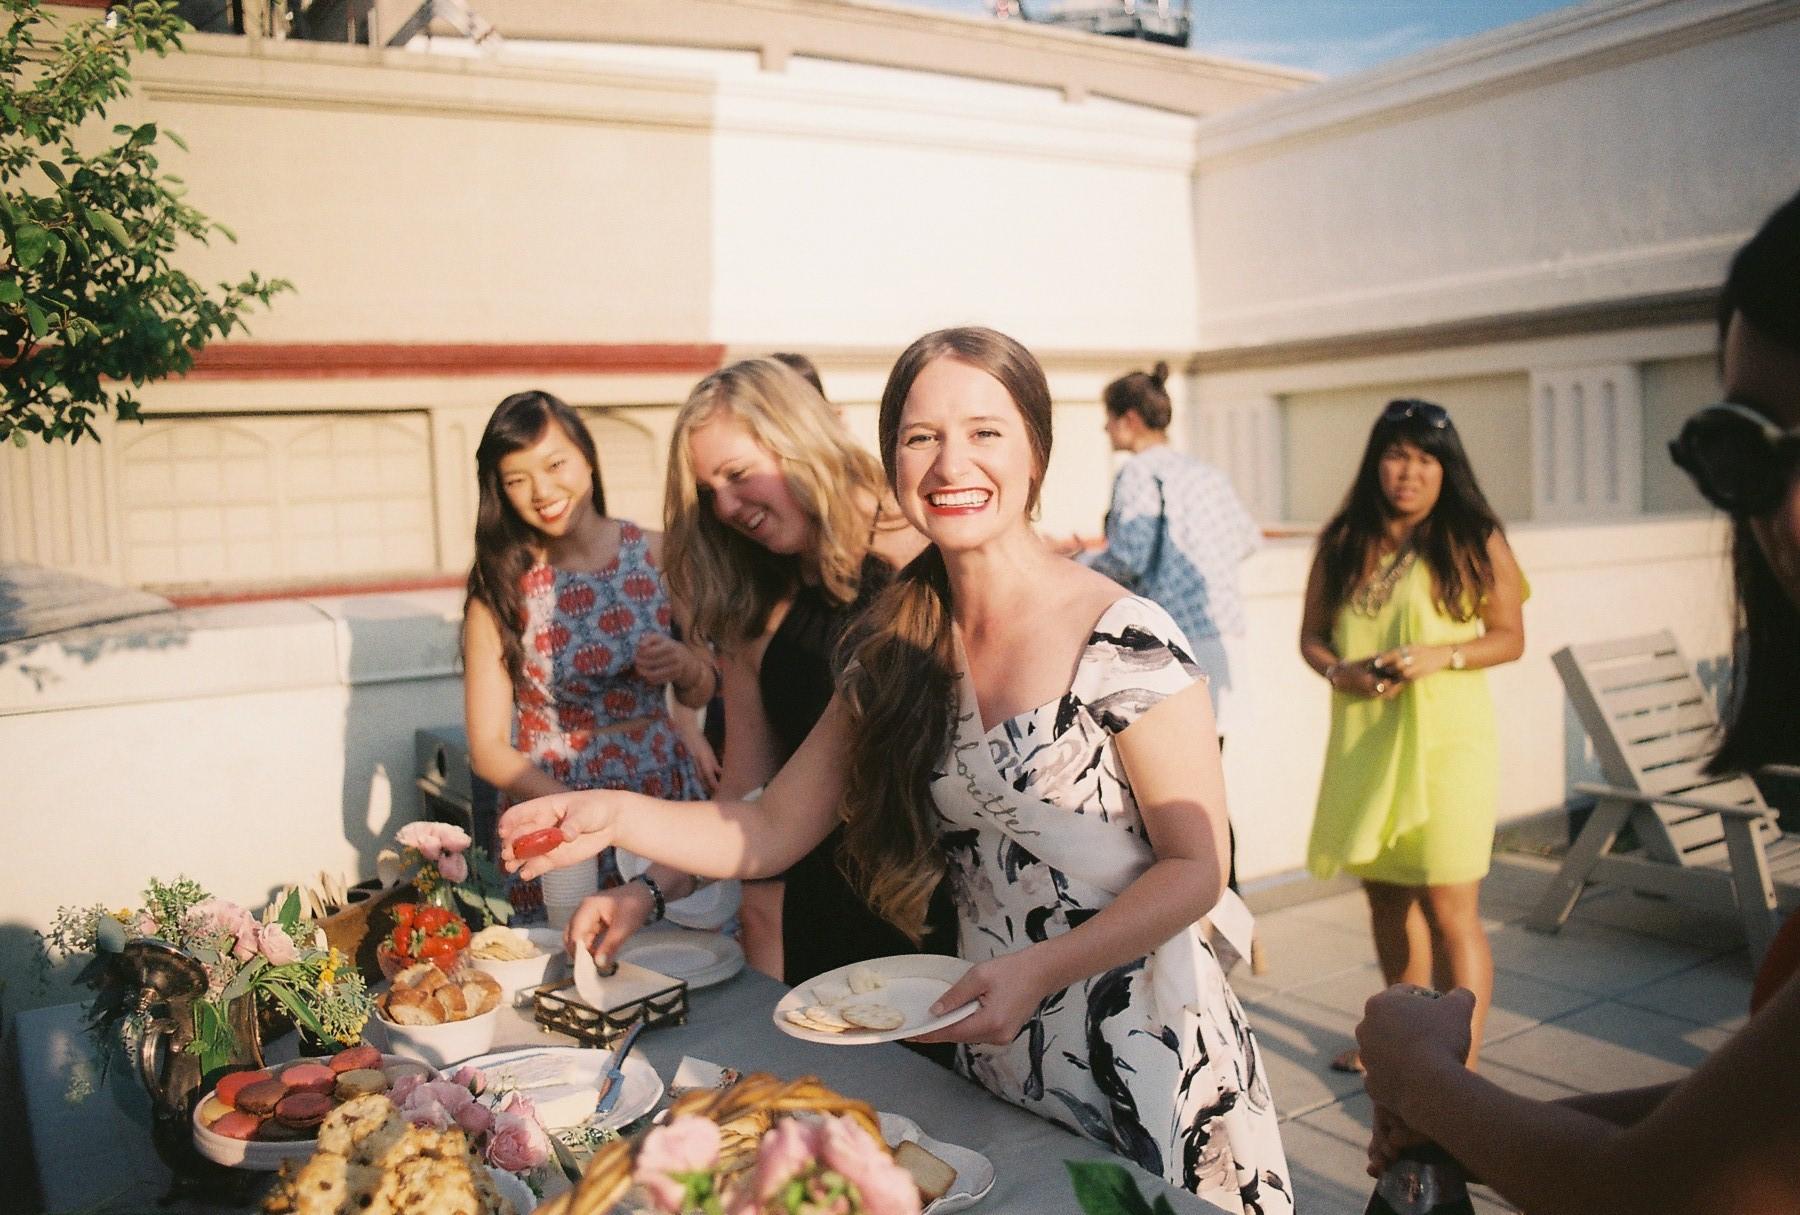 rooftop celebrations for Brynn's bachelorette! #brynnsbachelorettebash